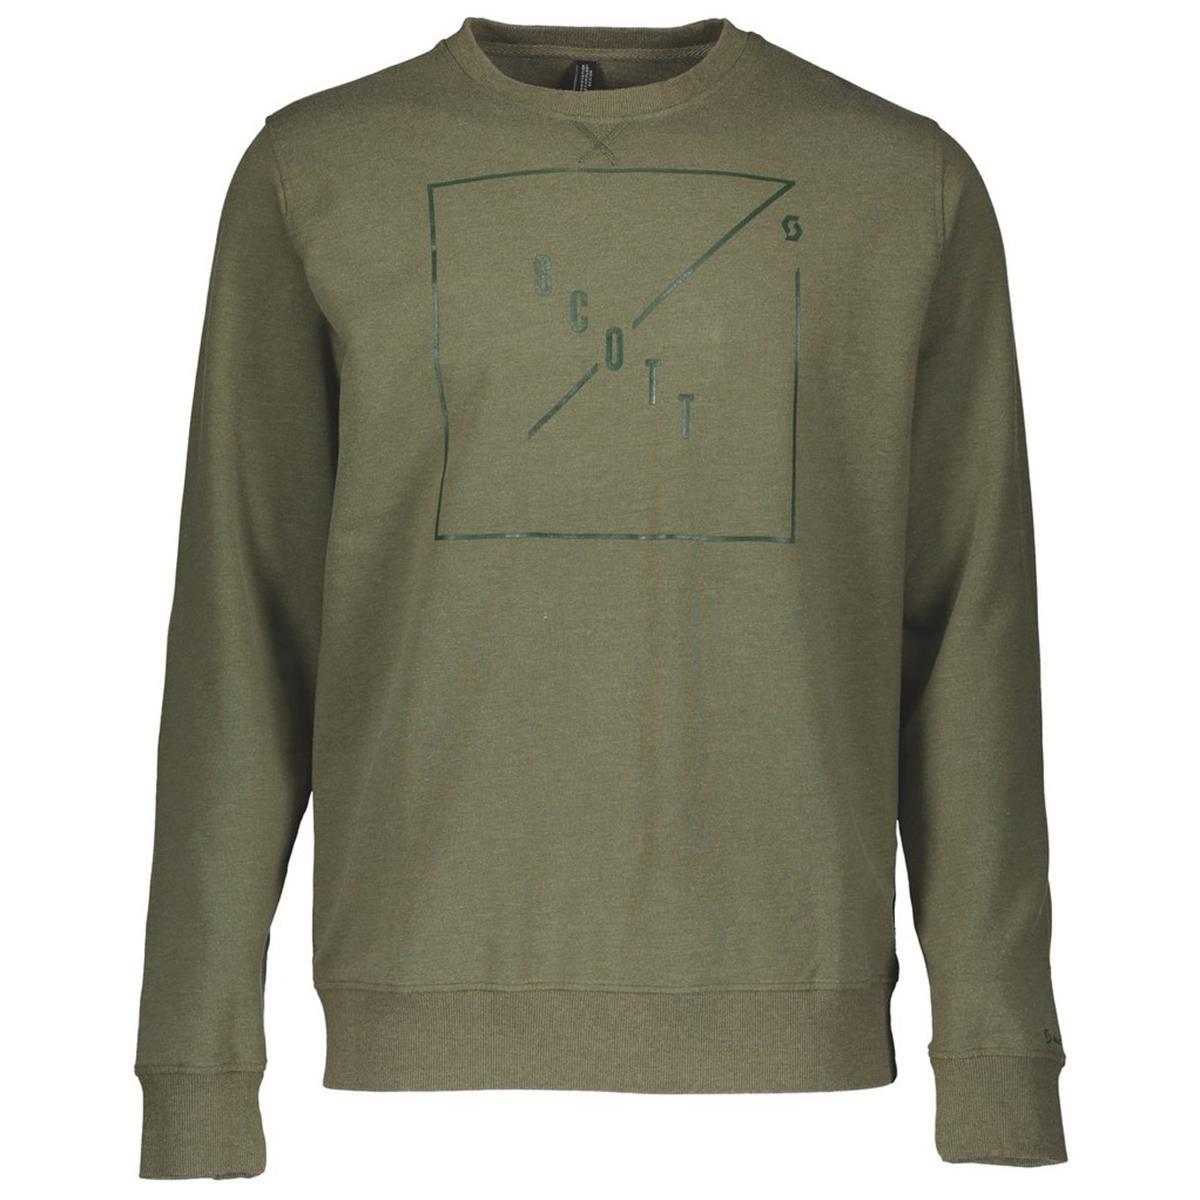 Scott Sweatshirt 10 Casual Crewneck Green Moss Melange